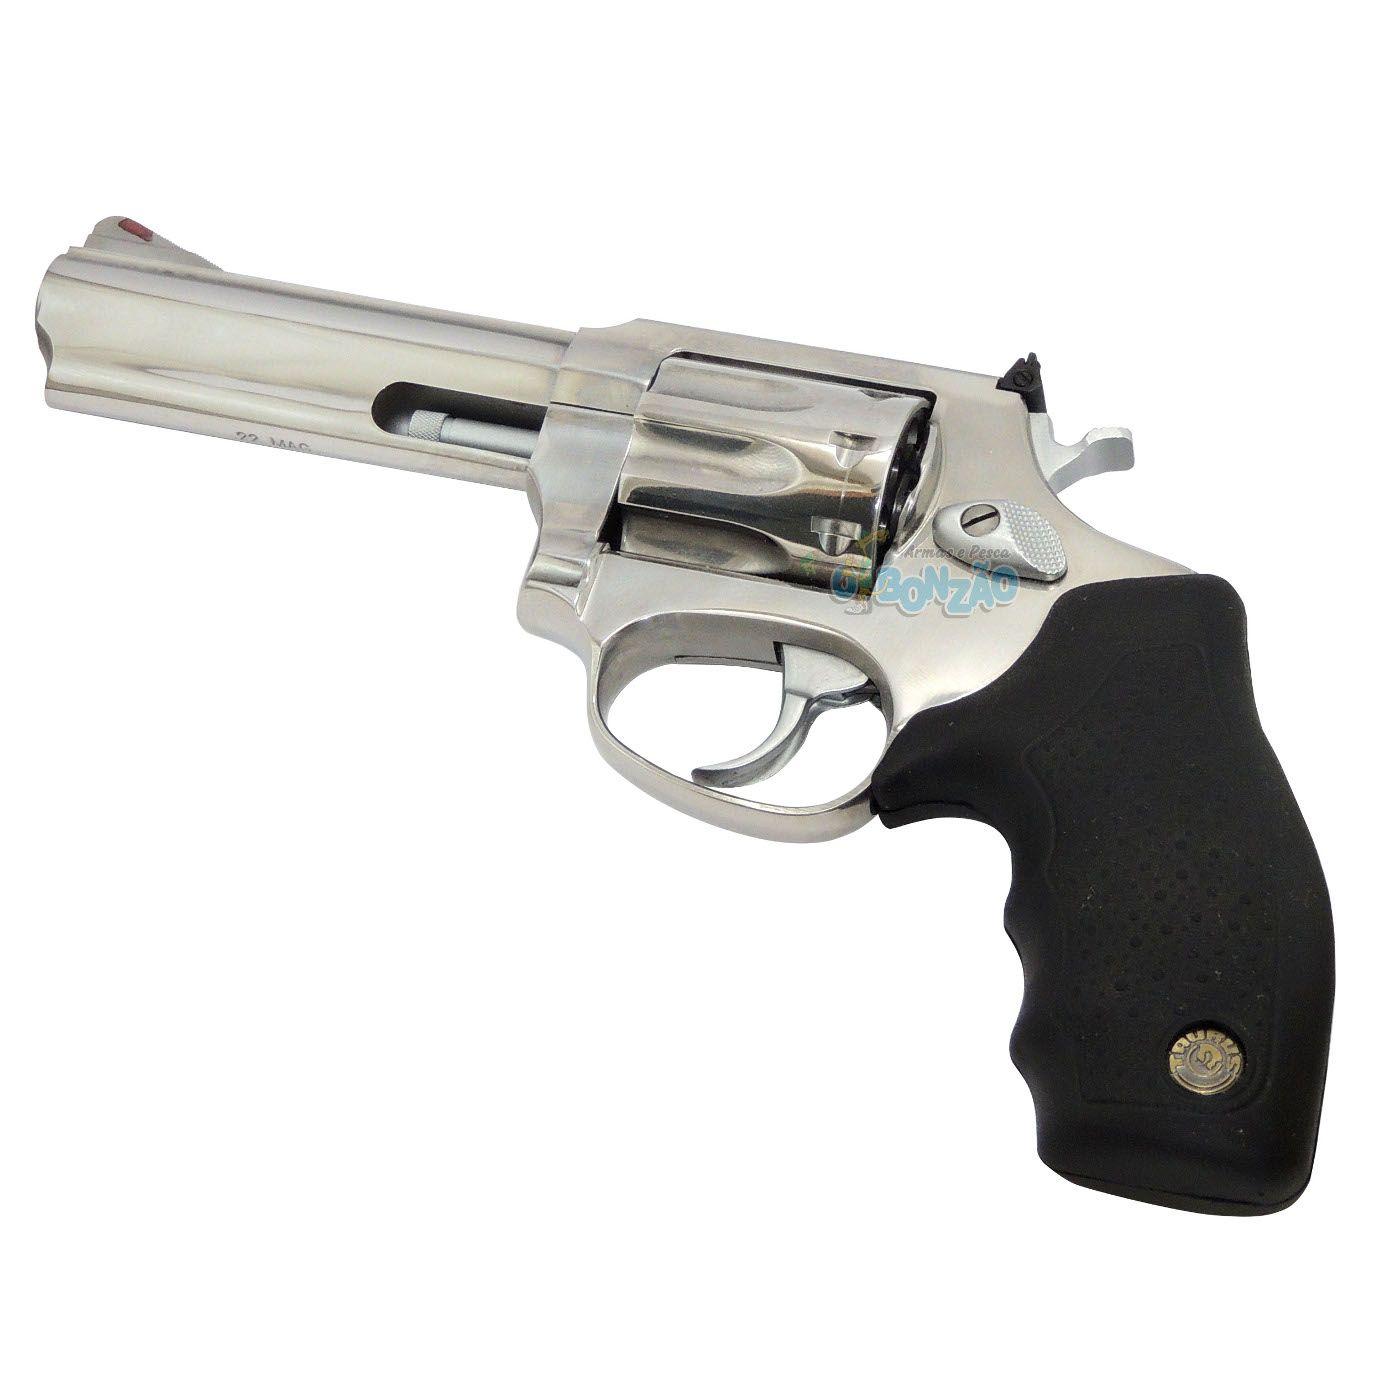 Revólver Taurus RT 941 - Cal .22 Magnum - 8 Tiros Cano 4